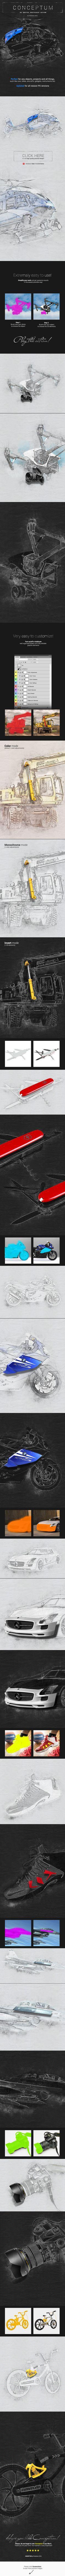 Conceptum - 3D Sketch Photoshop Action - Photo Effects Actions